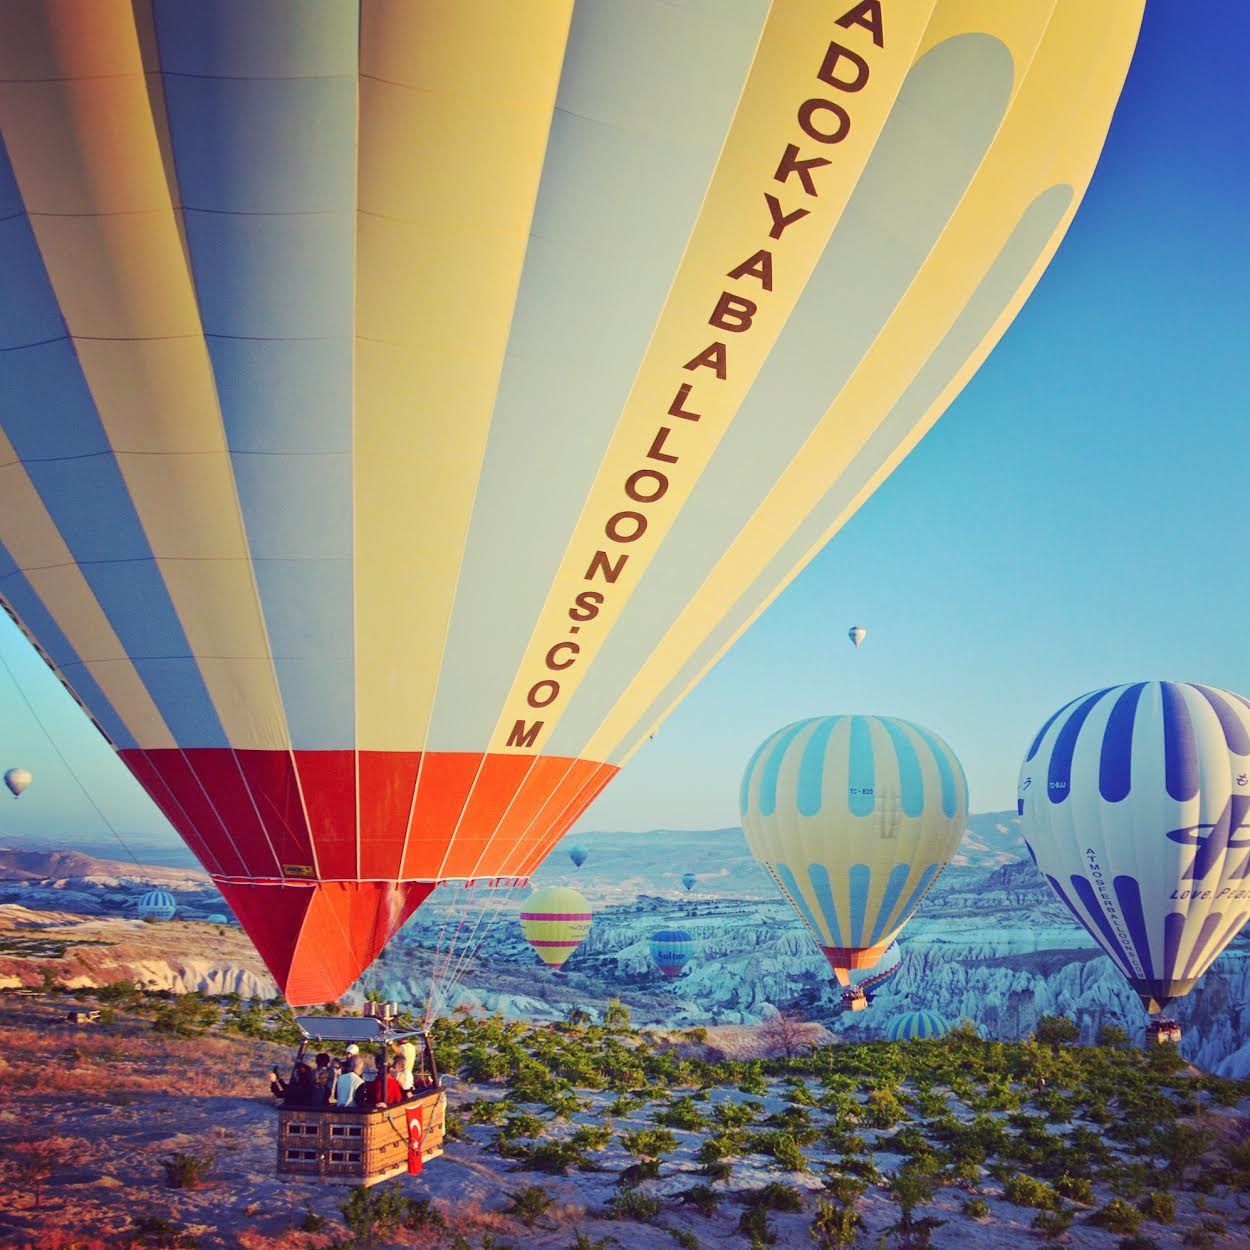 Cappadocia, Turkey Photo: Lesley Ames, BonViage